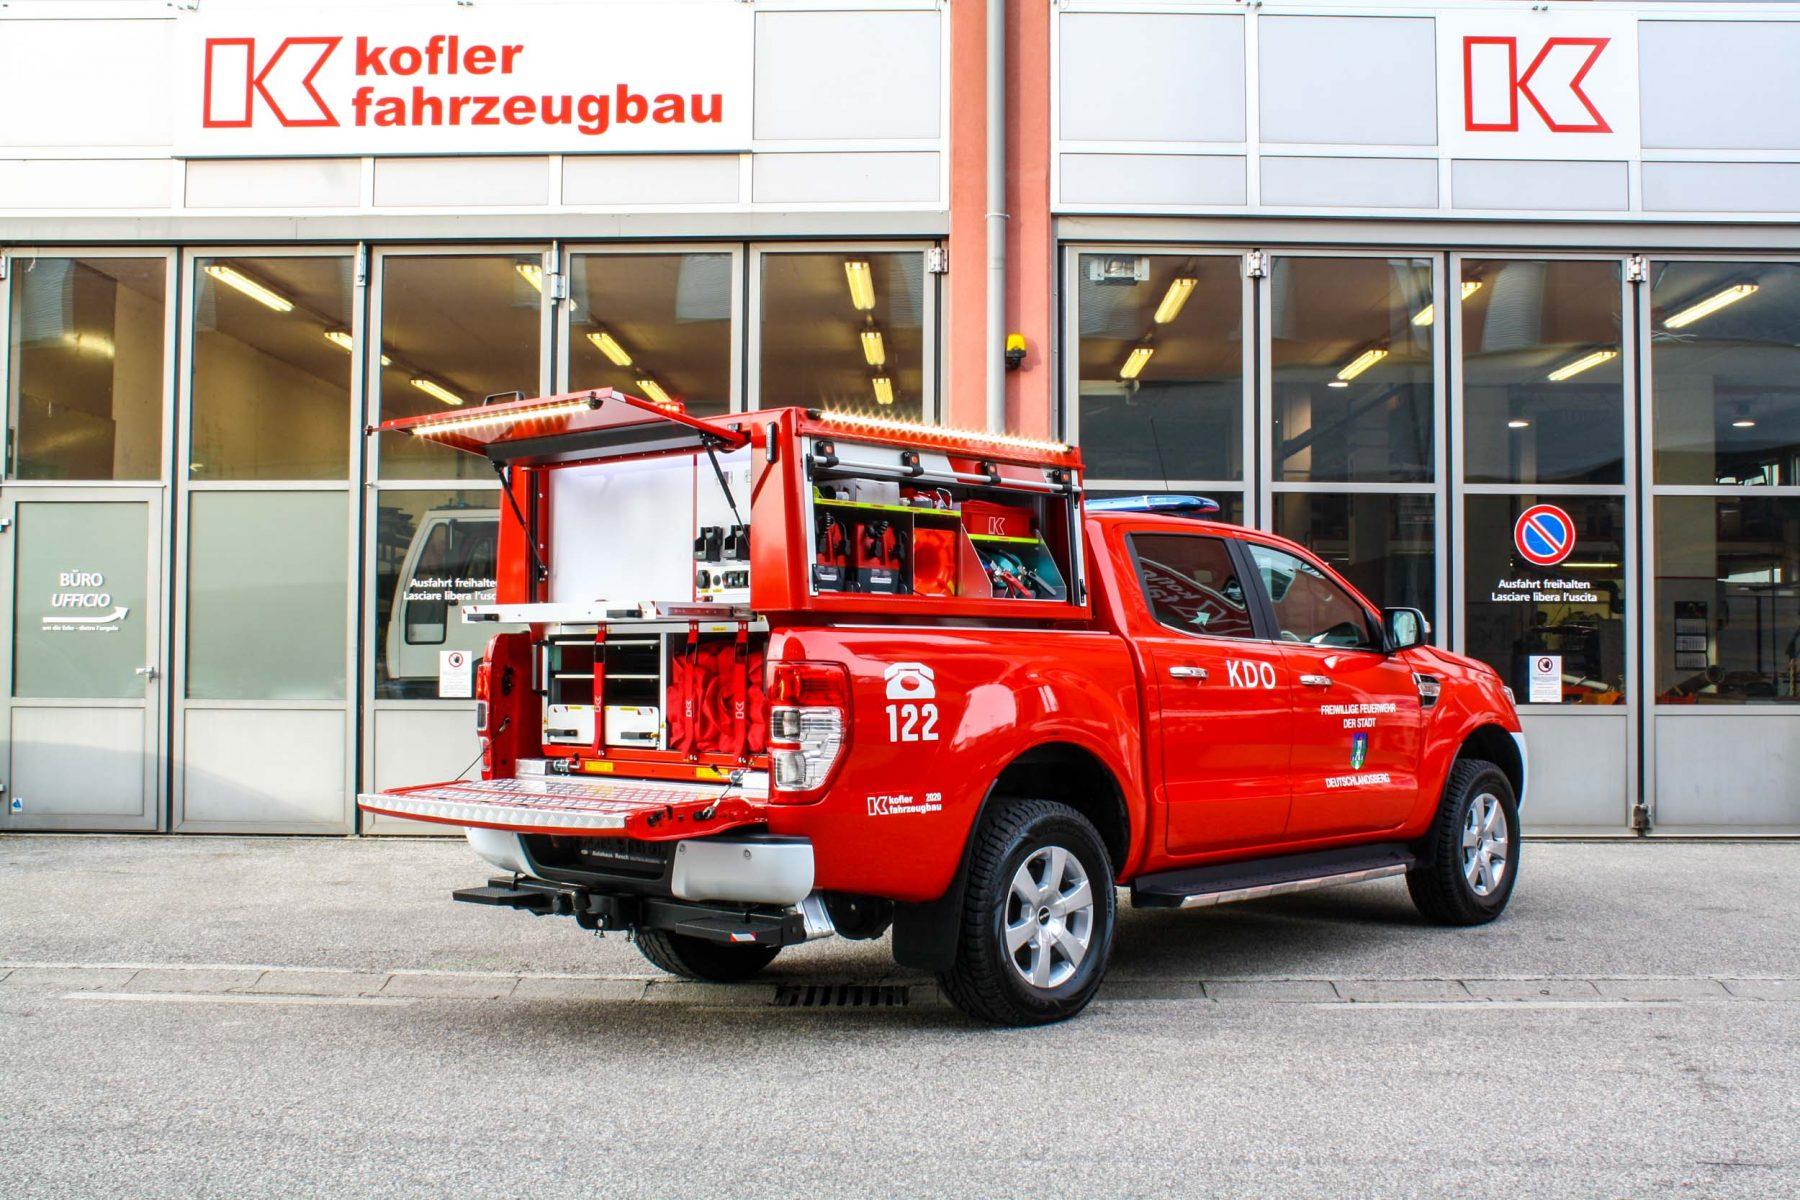 Kofler-Fahrzeugbau-FF-Deutschlandsberg2